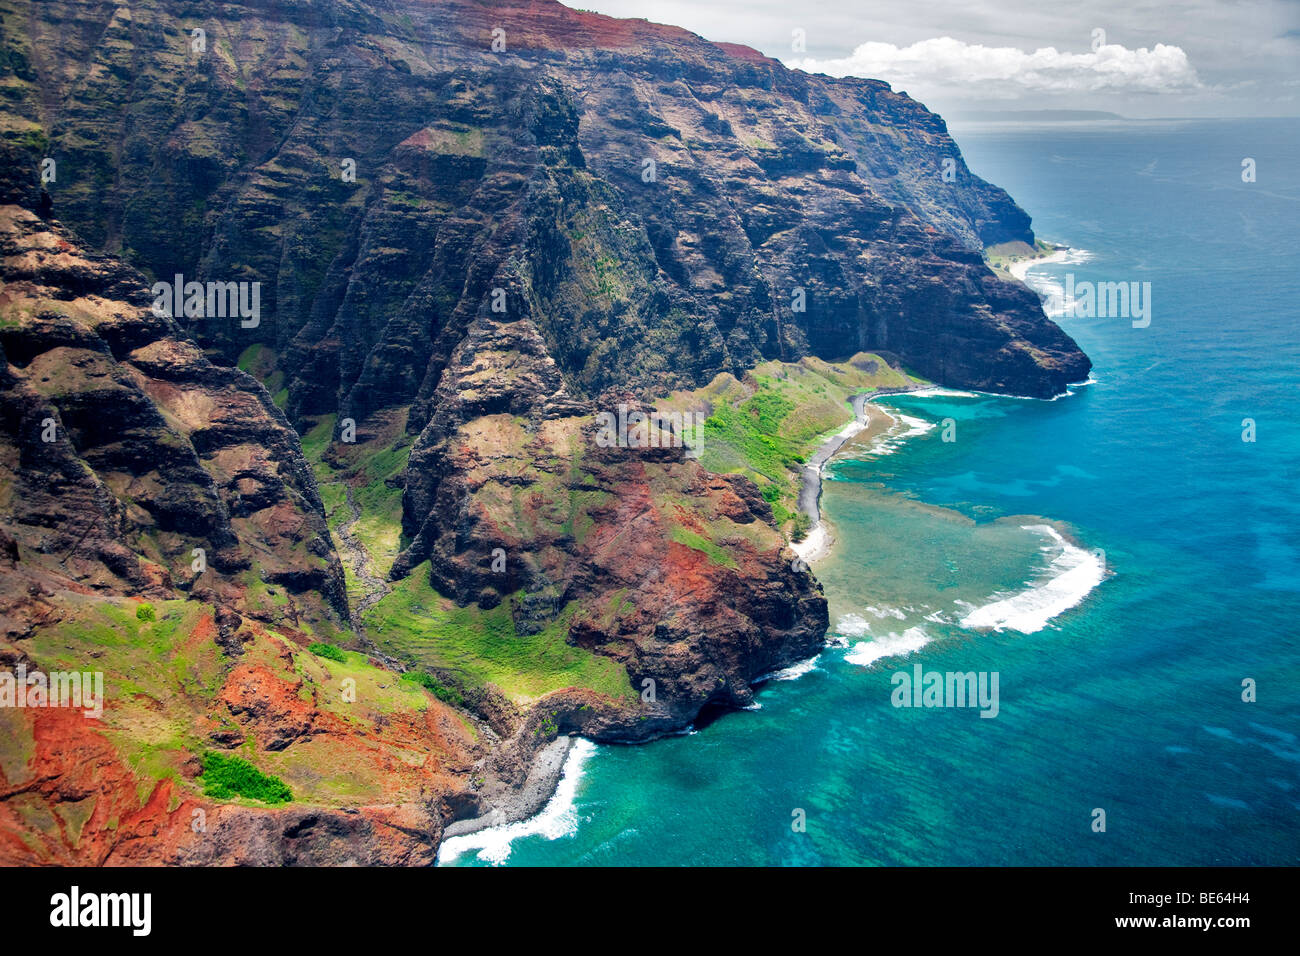 Na Pali Costa da l'aria. Kauai, Hawaii. Foto Stock